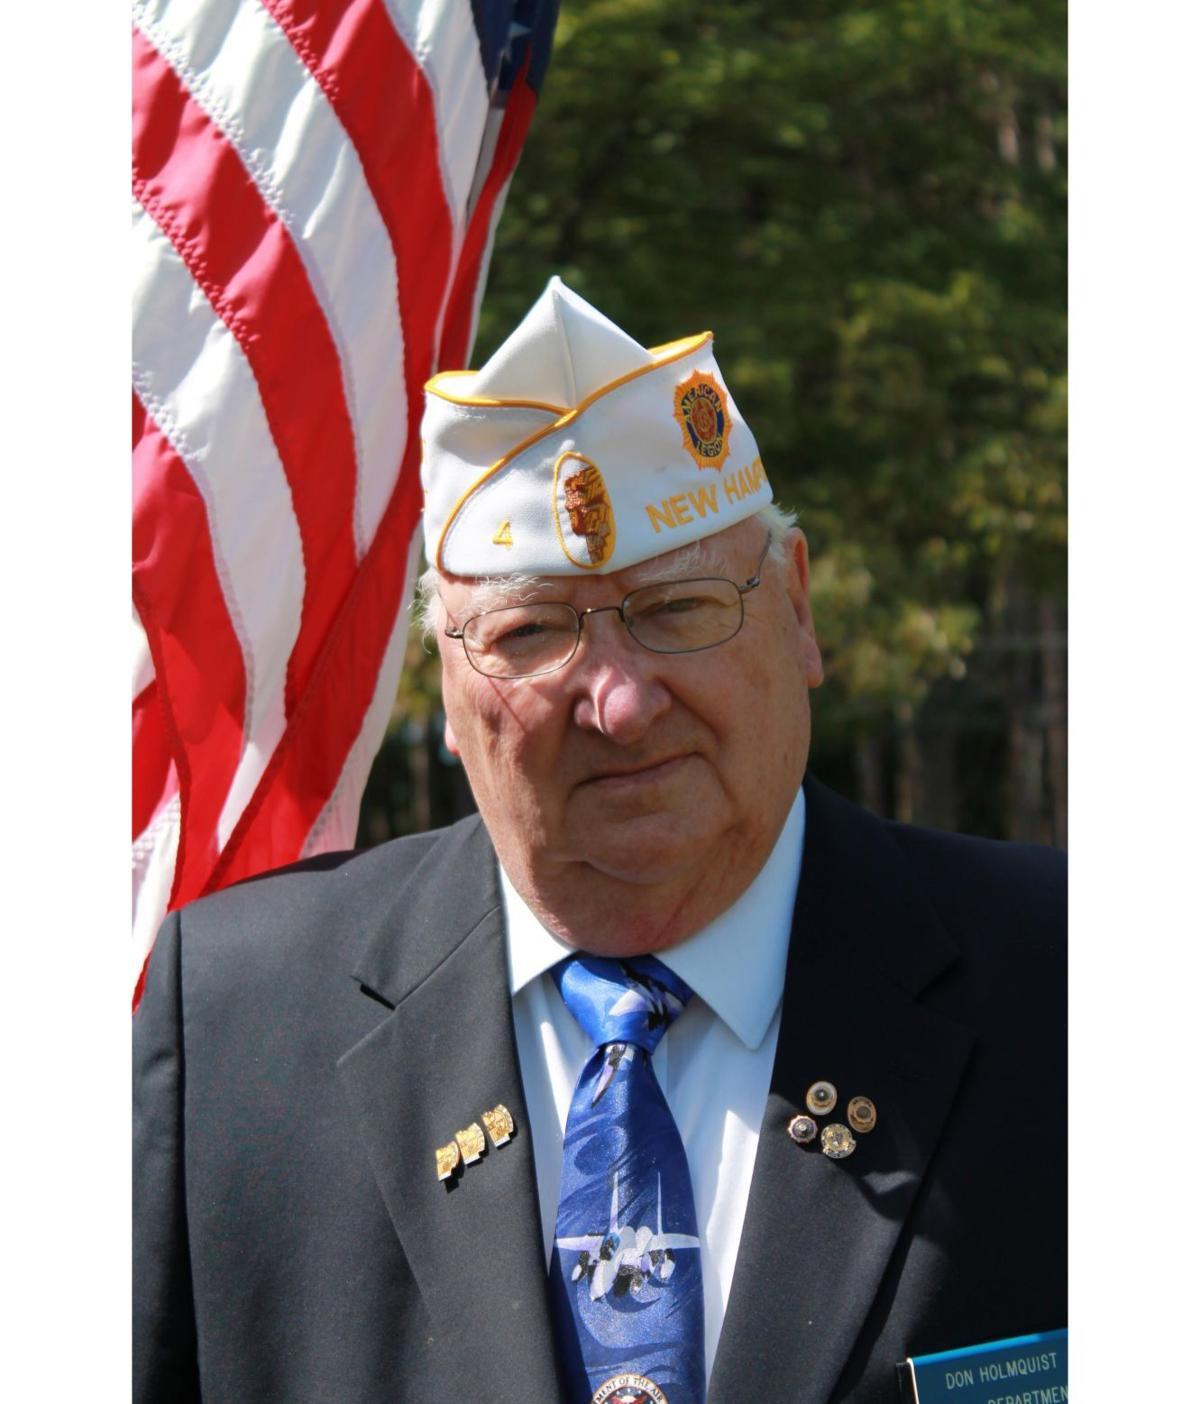 Donald I. Holmquist